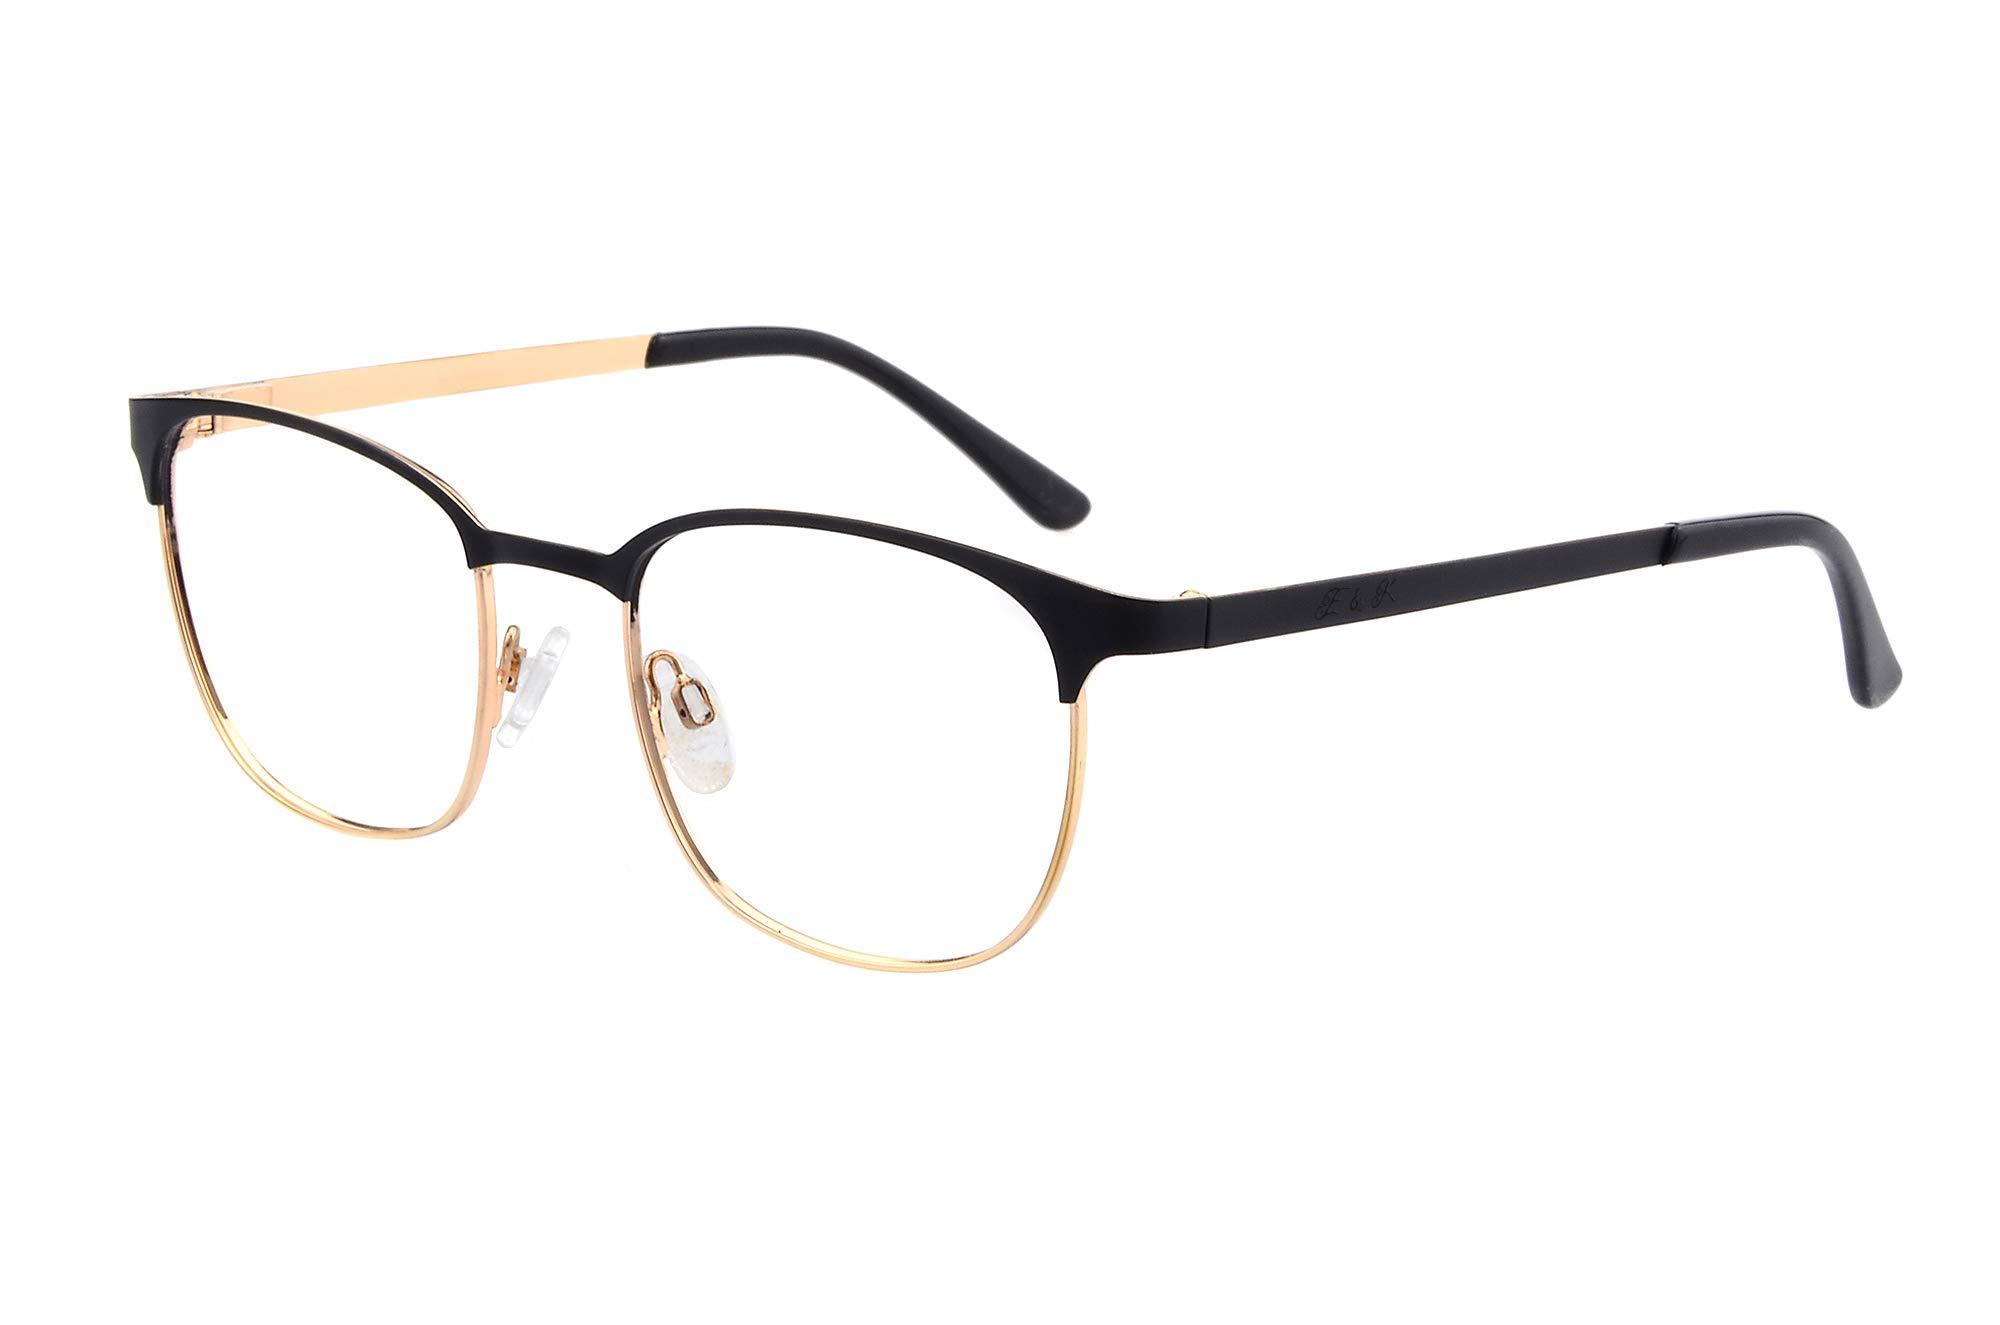 Edison & King Royal reading glasses - timeless elegance with premium lenses incl. Bluelight Protect (+1.00 dpt, black-gold)